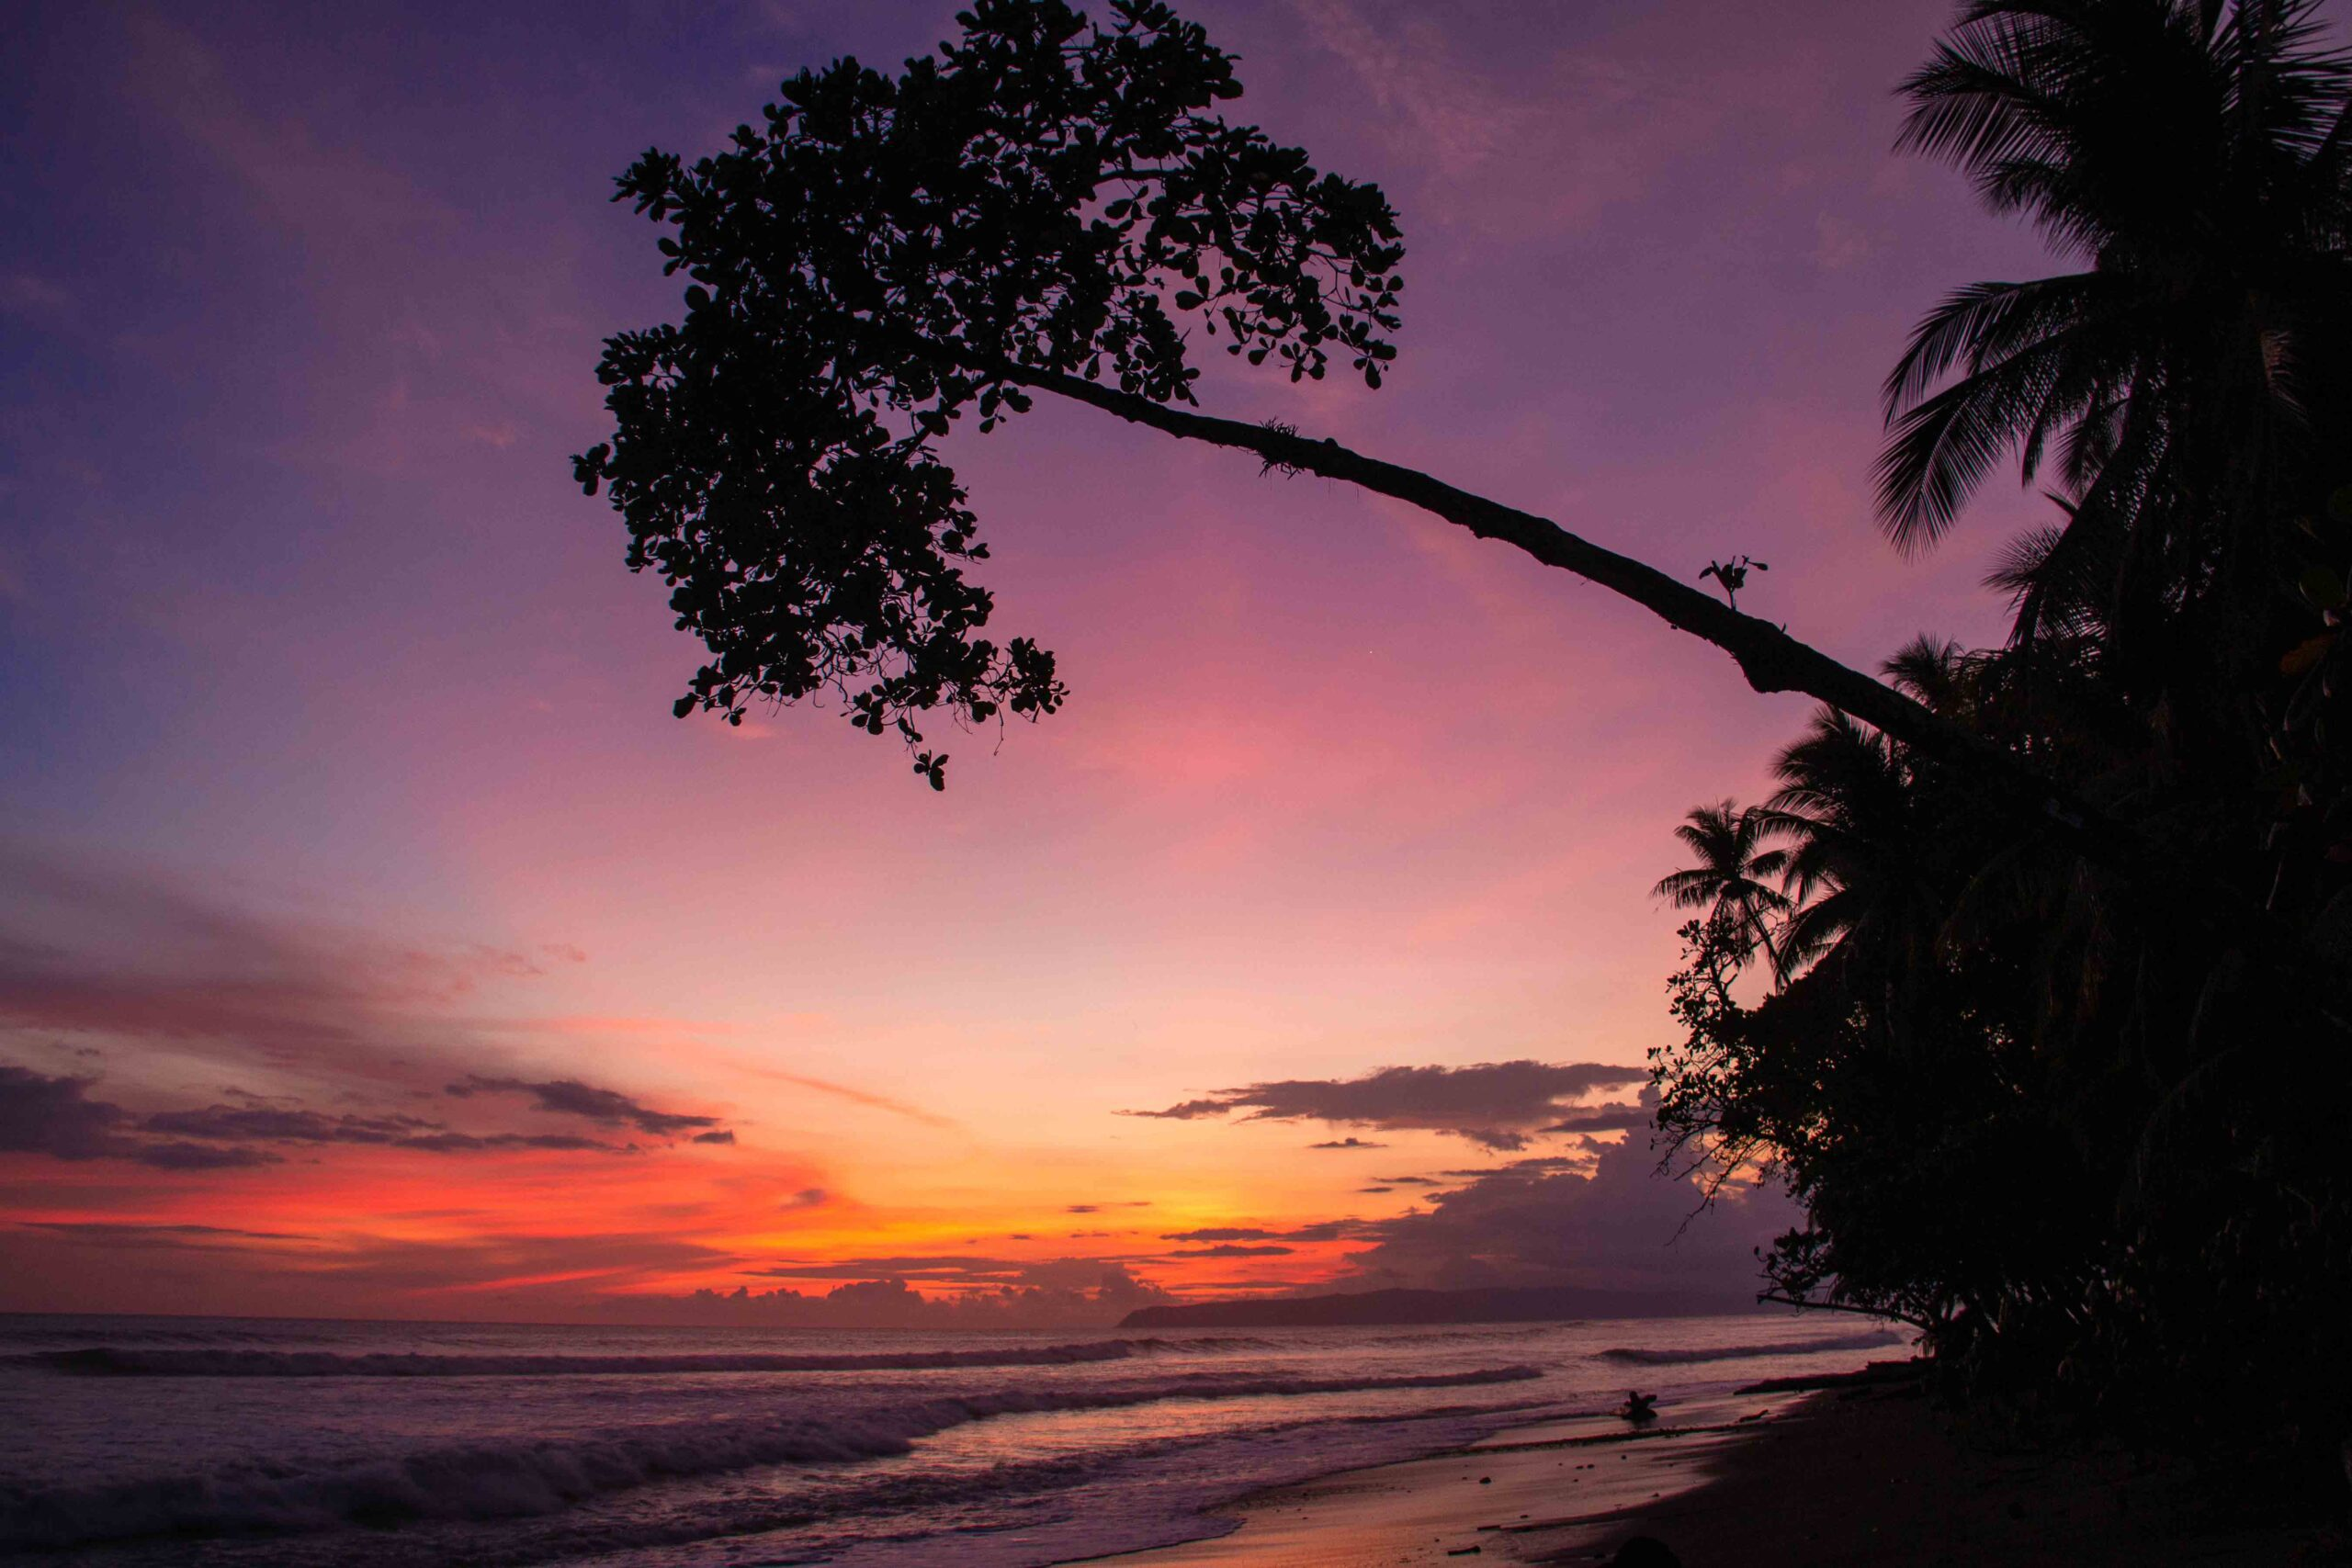 Sunset in Punta Banco Costa Rica